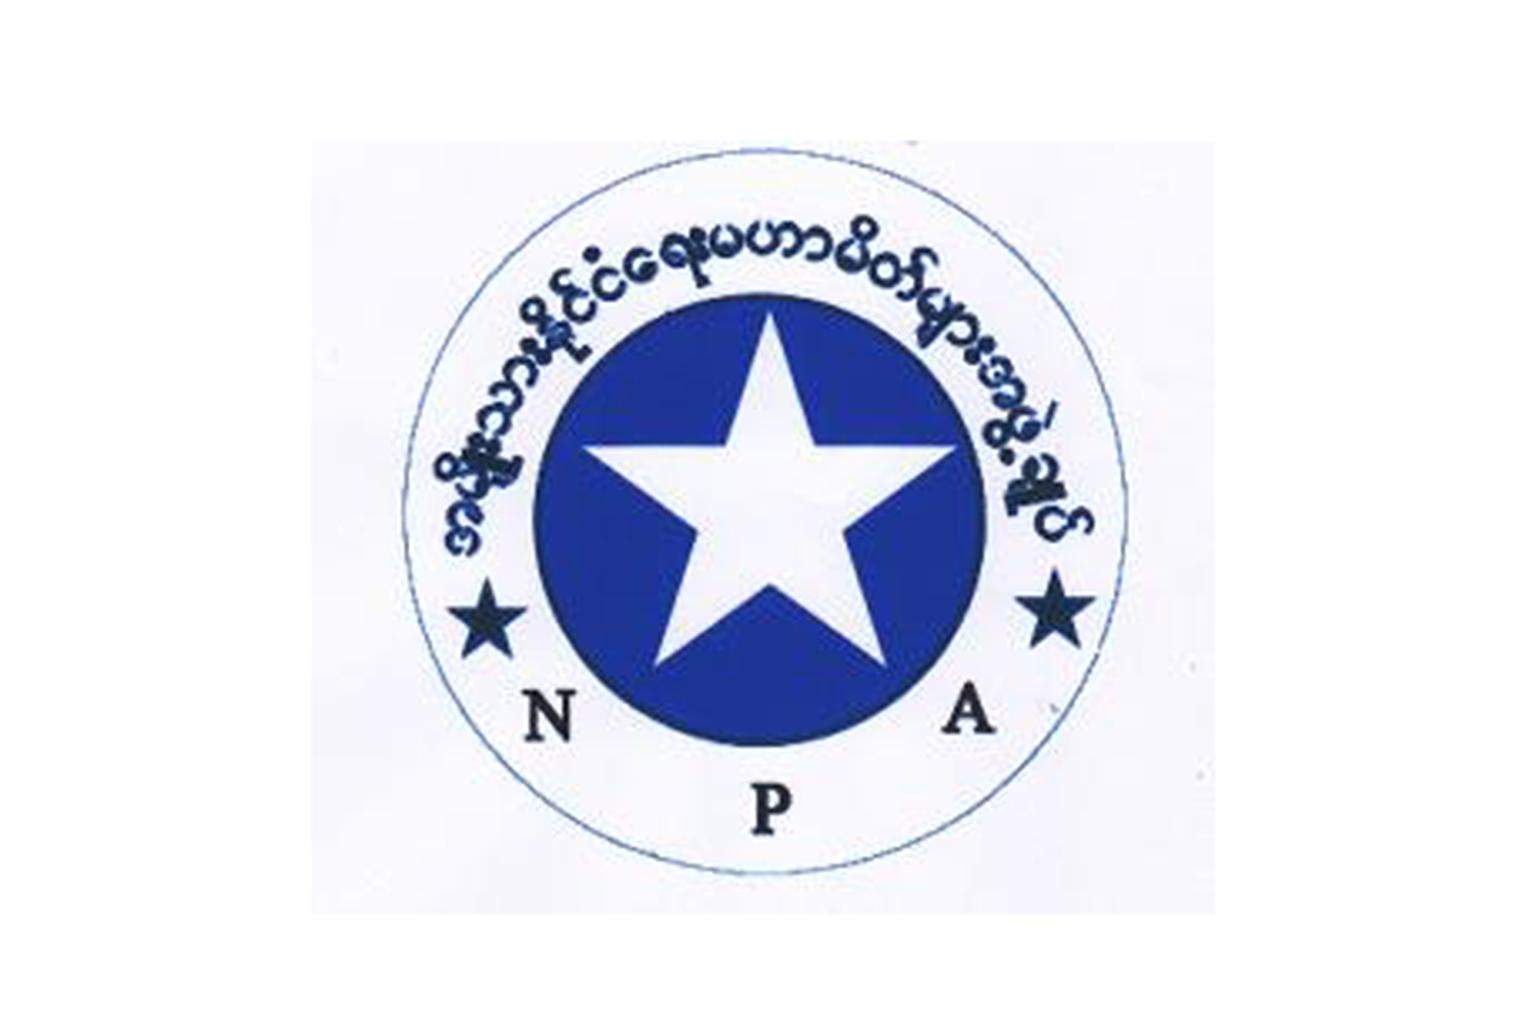 National Political Alliance Party NPA logo